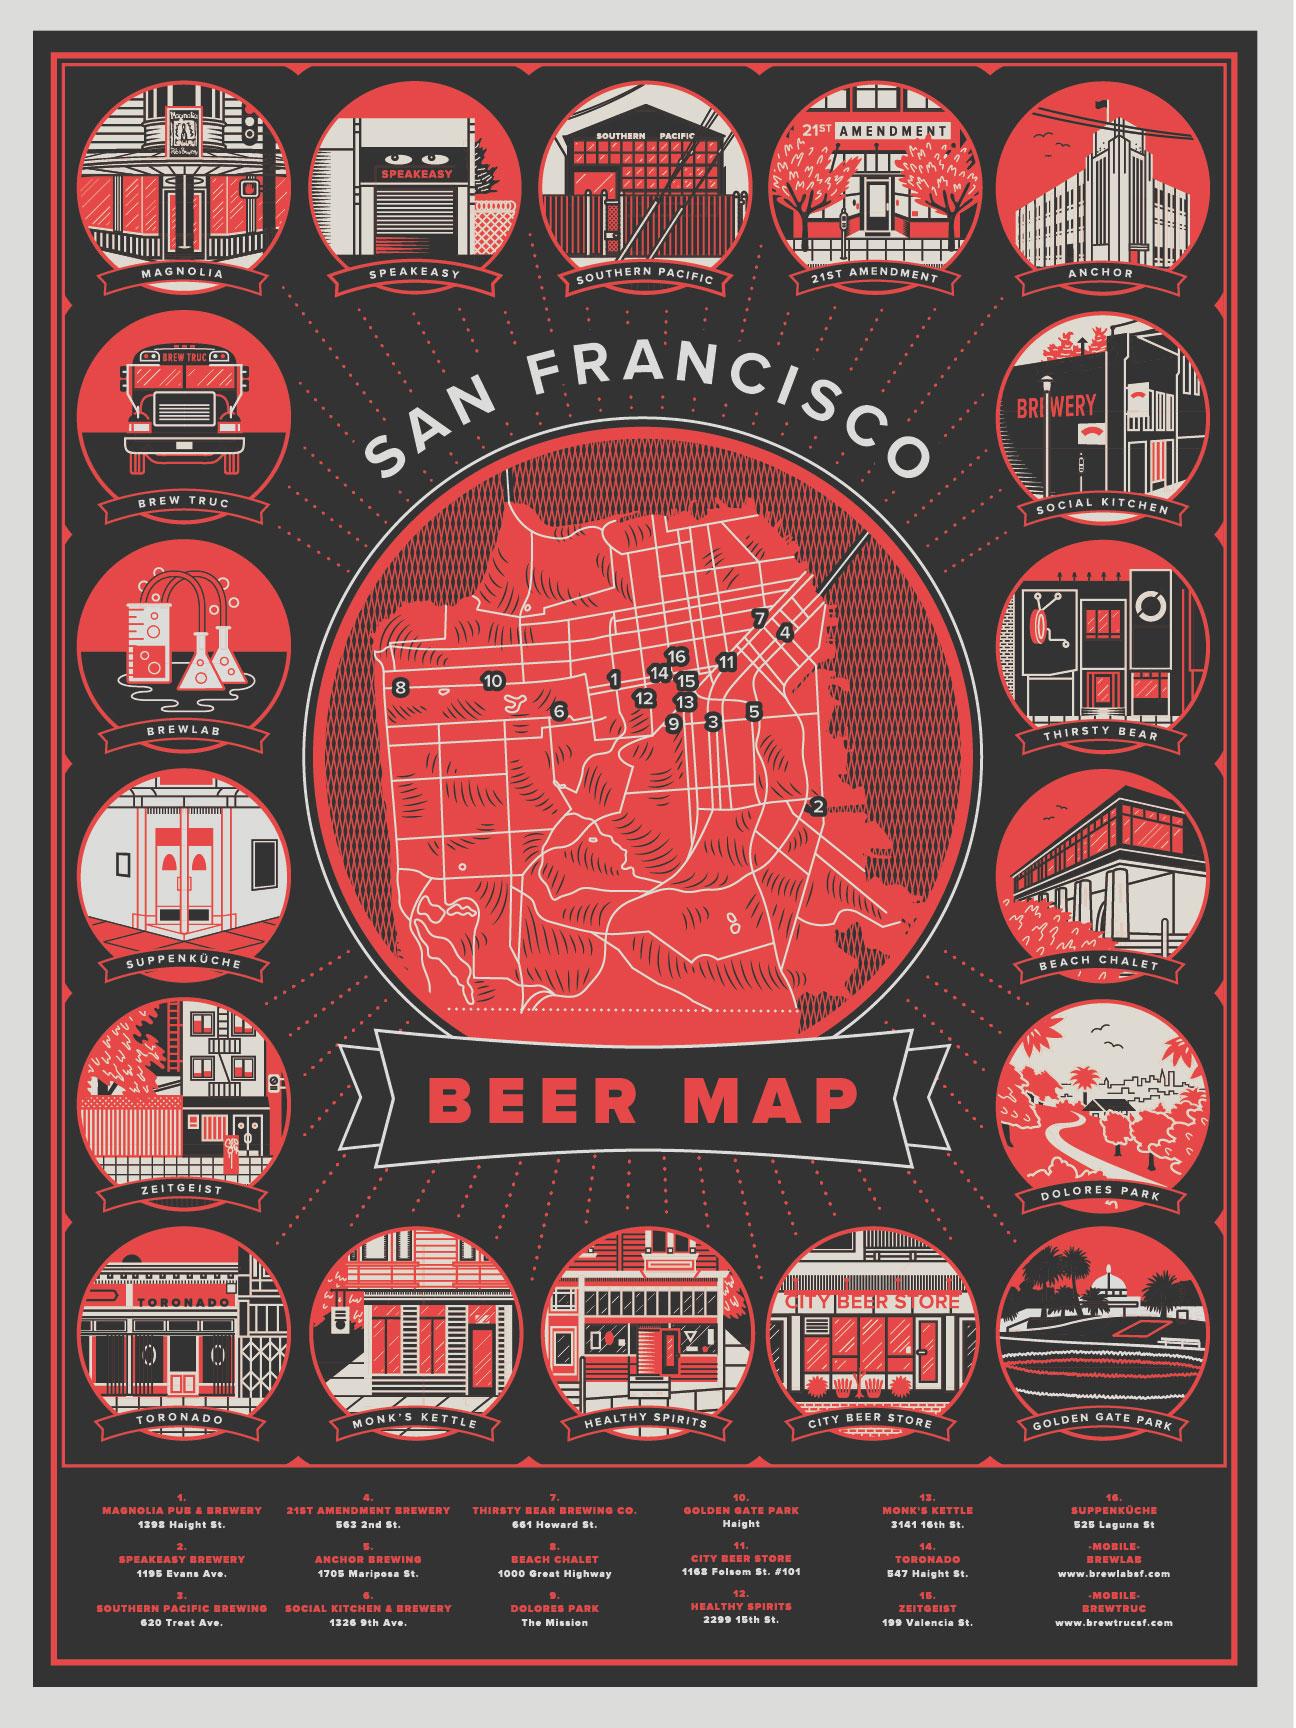 BI_Beer_Map_Final_v4-01.jpg